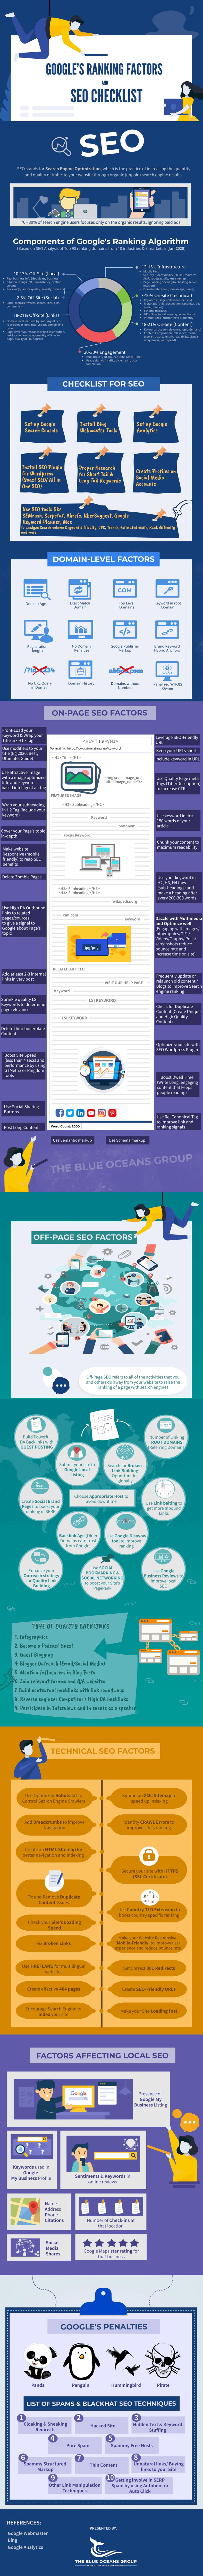 Google Ranking Factors Guide